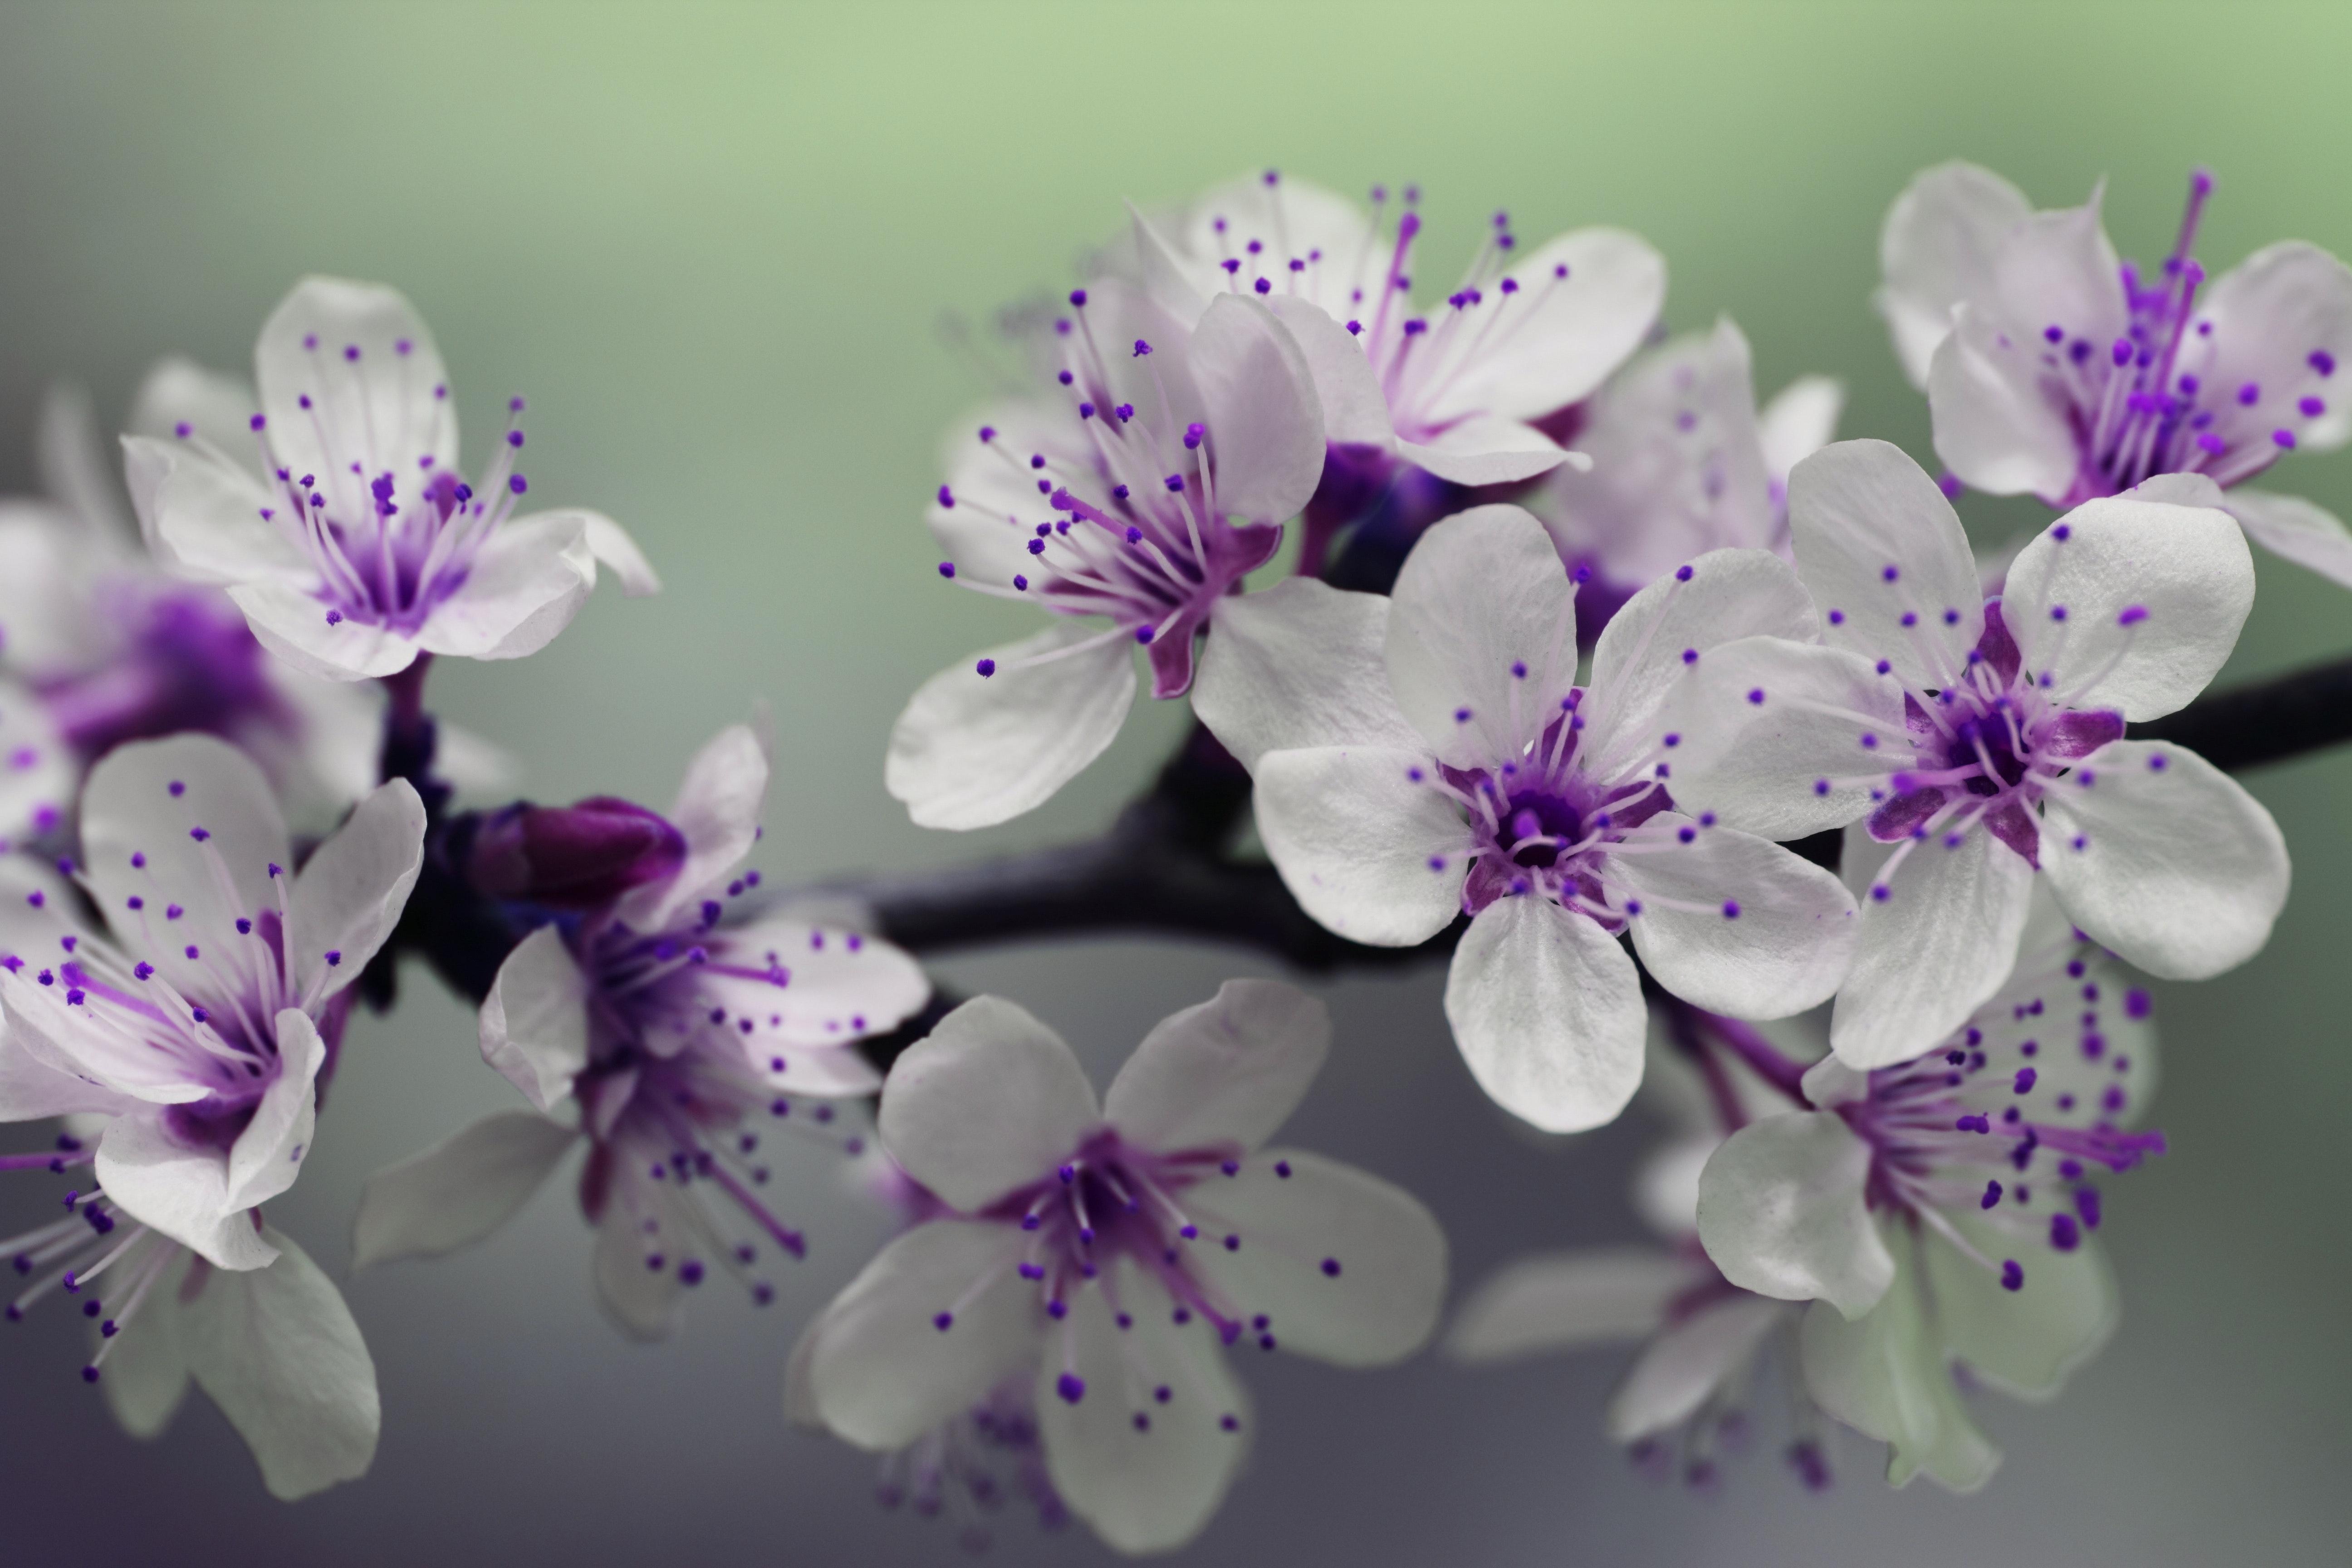 Free photo white and purple petal flower focus photography pretty white and purple petal flower focus photography mightylinksfo